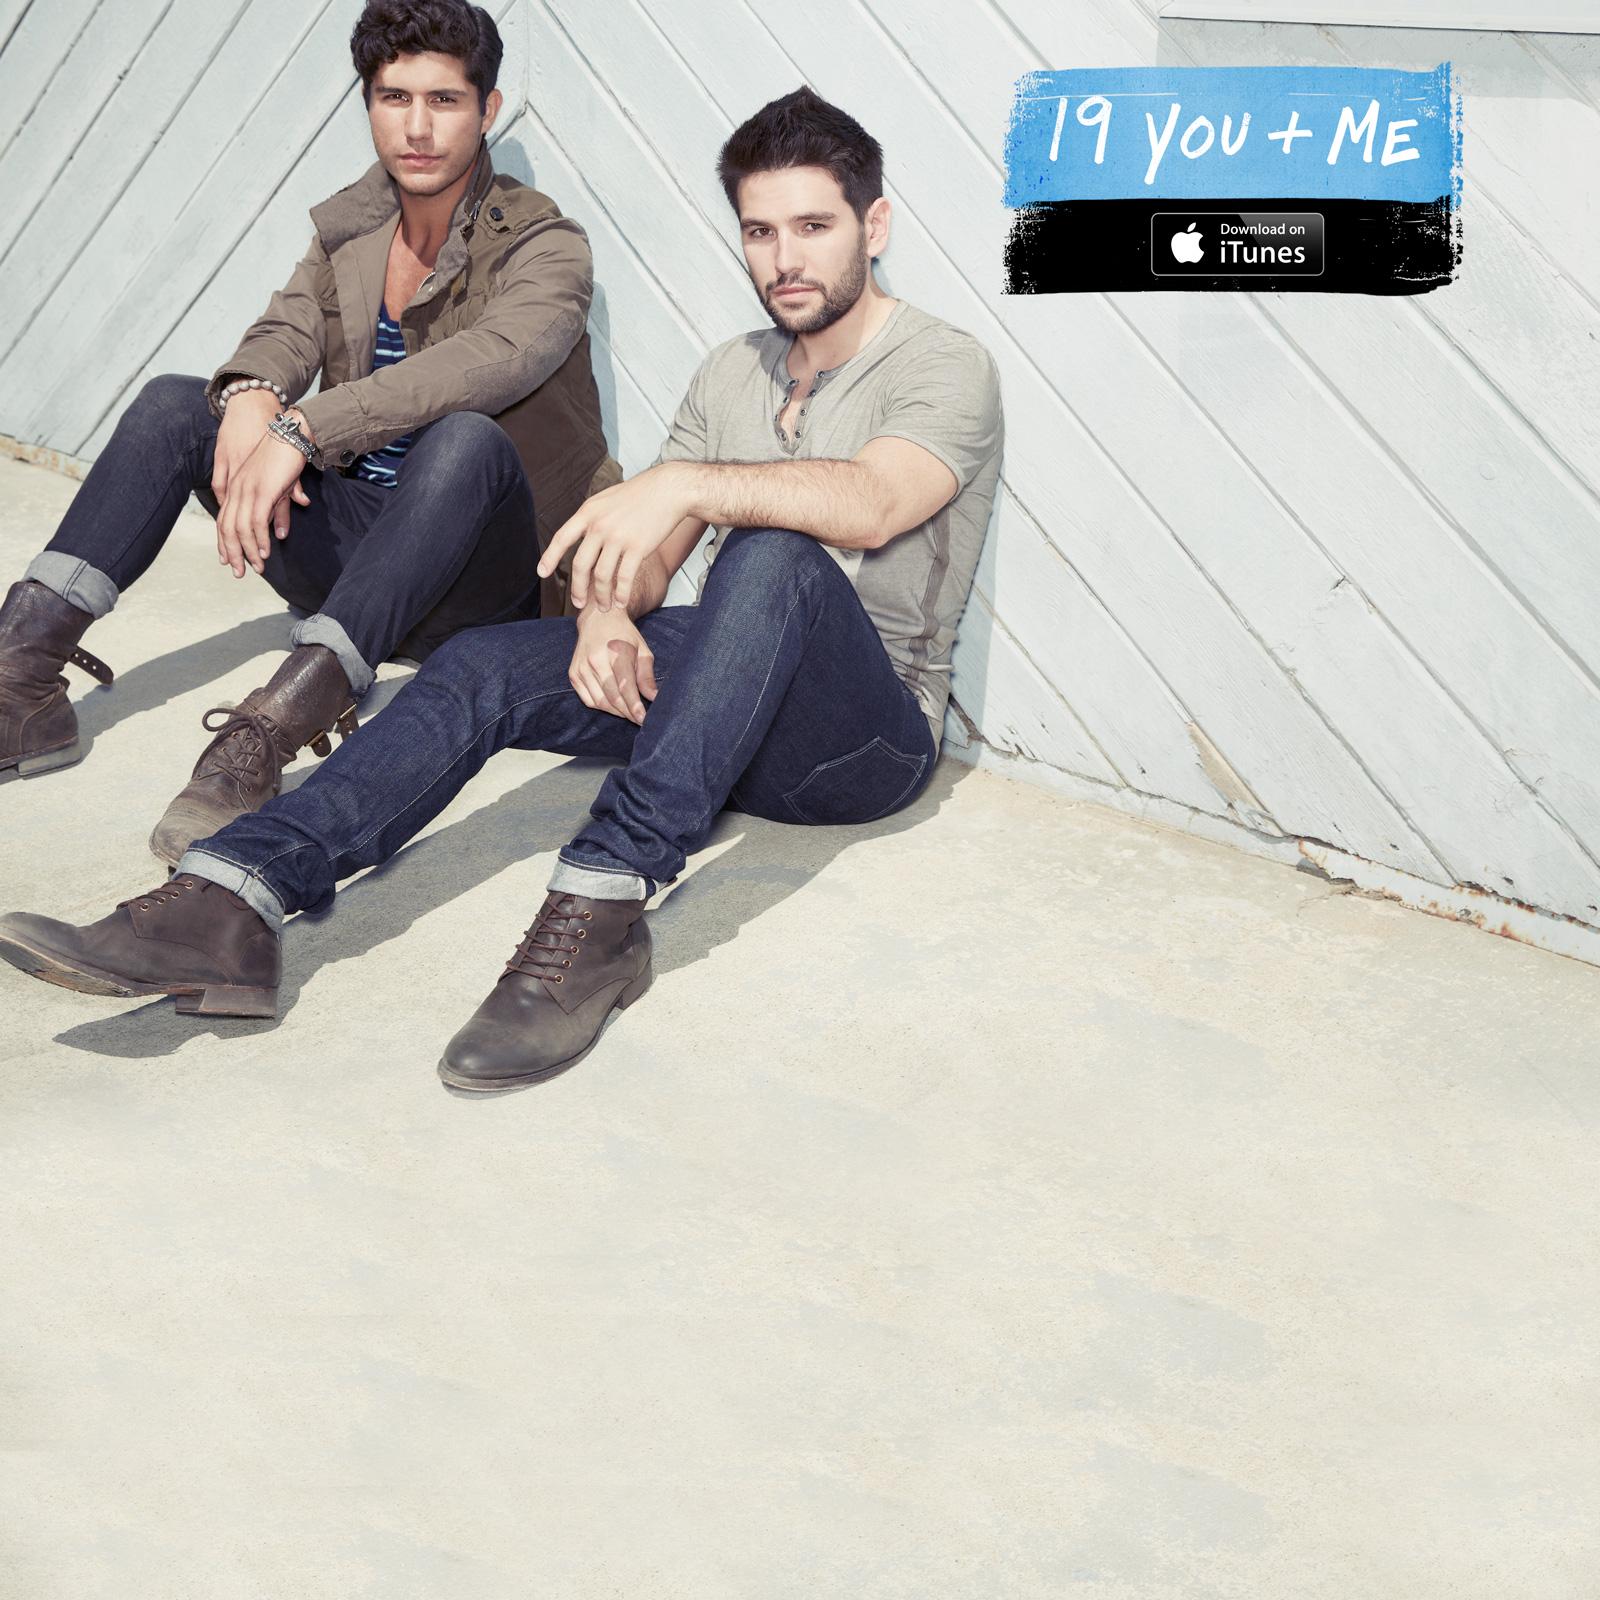 D+S Official Website: Where It All Began. Music, Videos